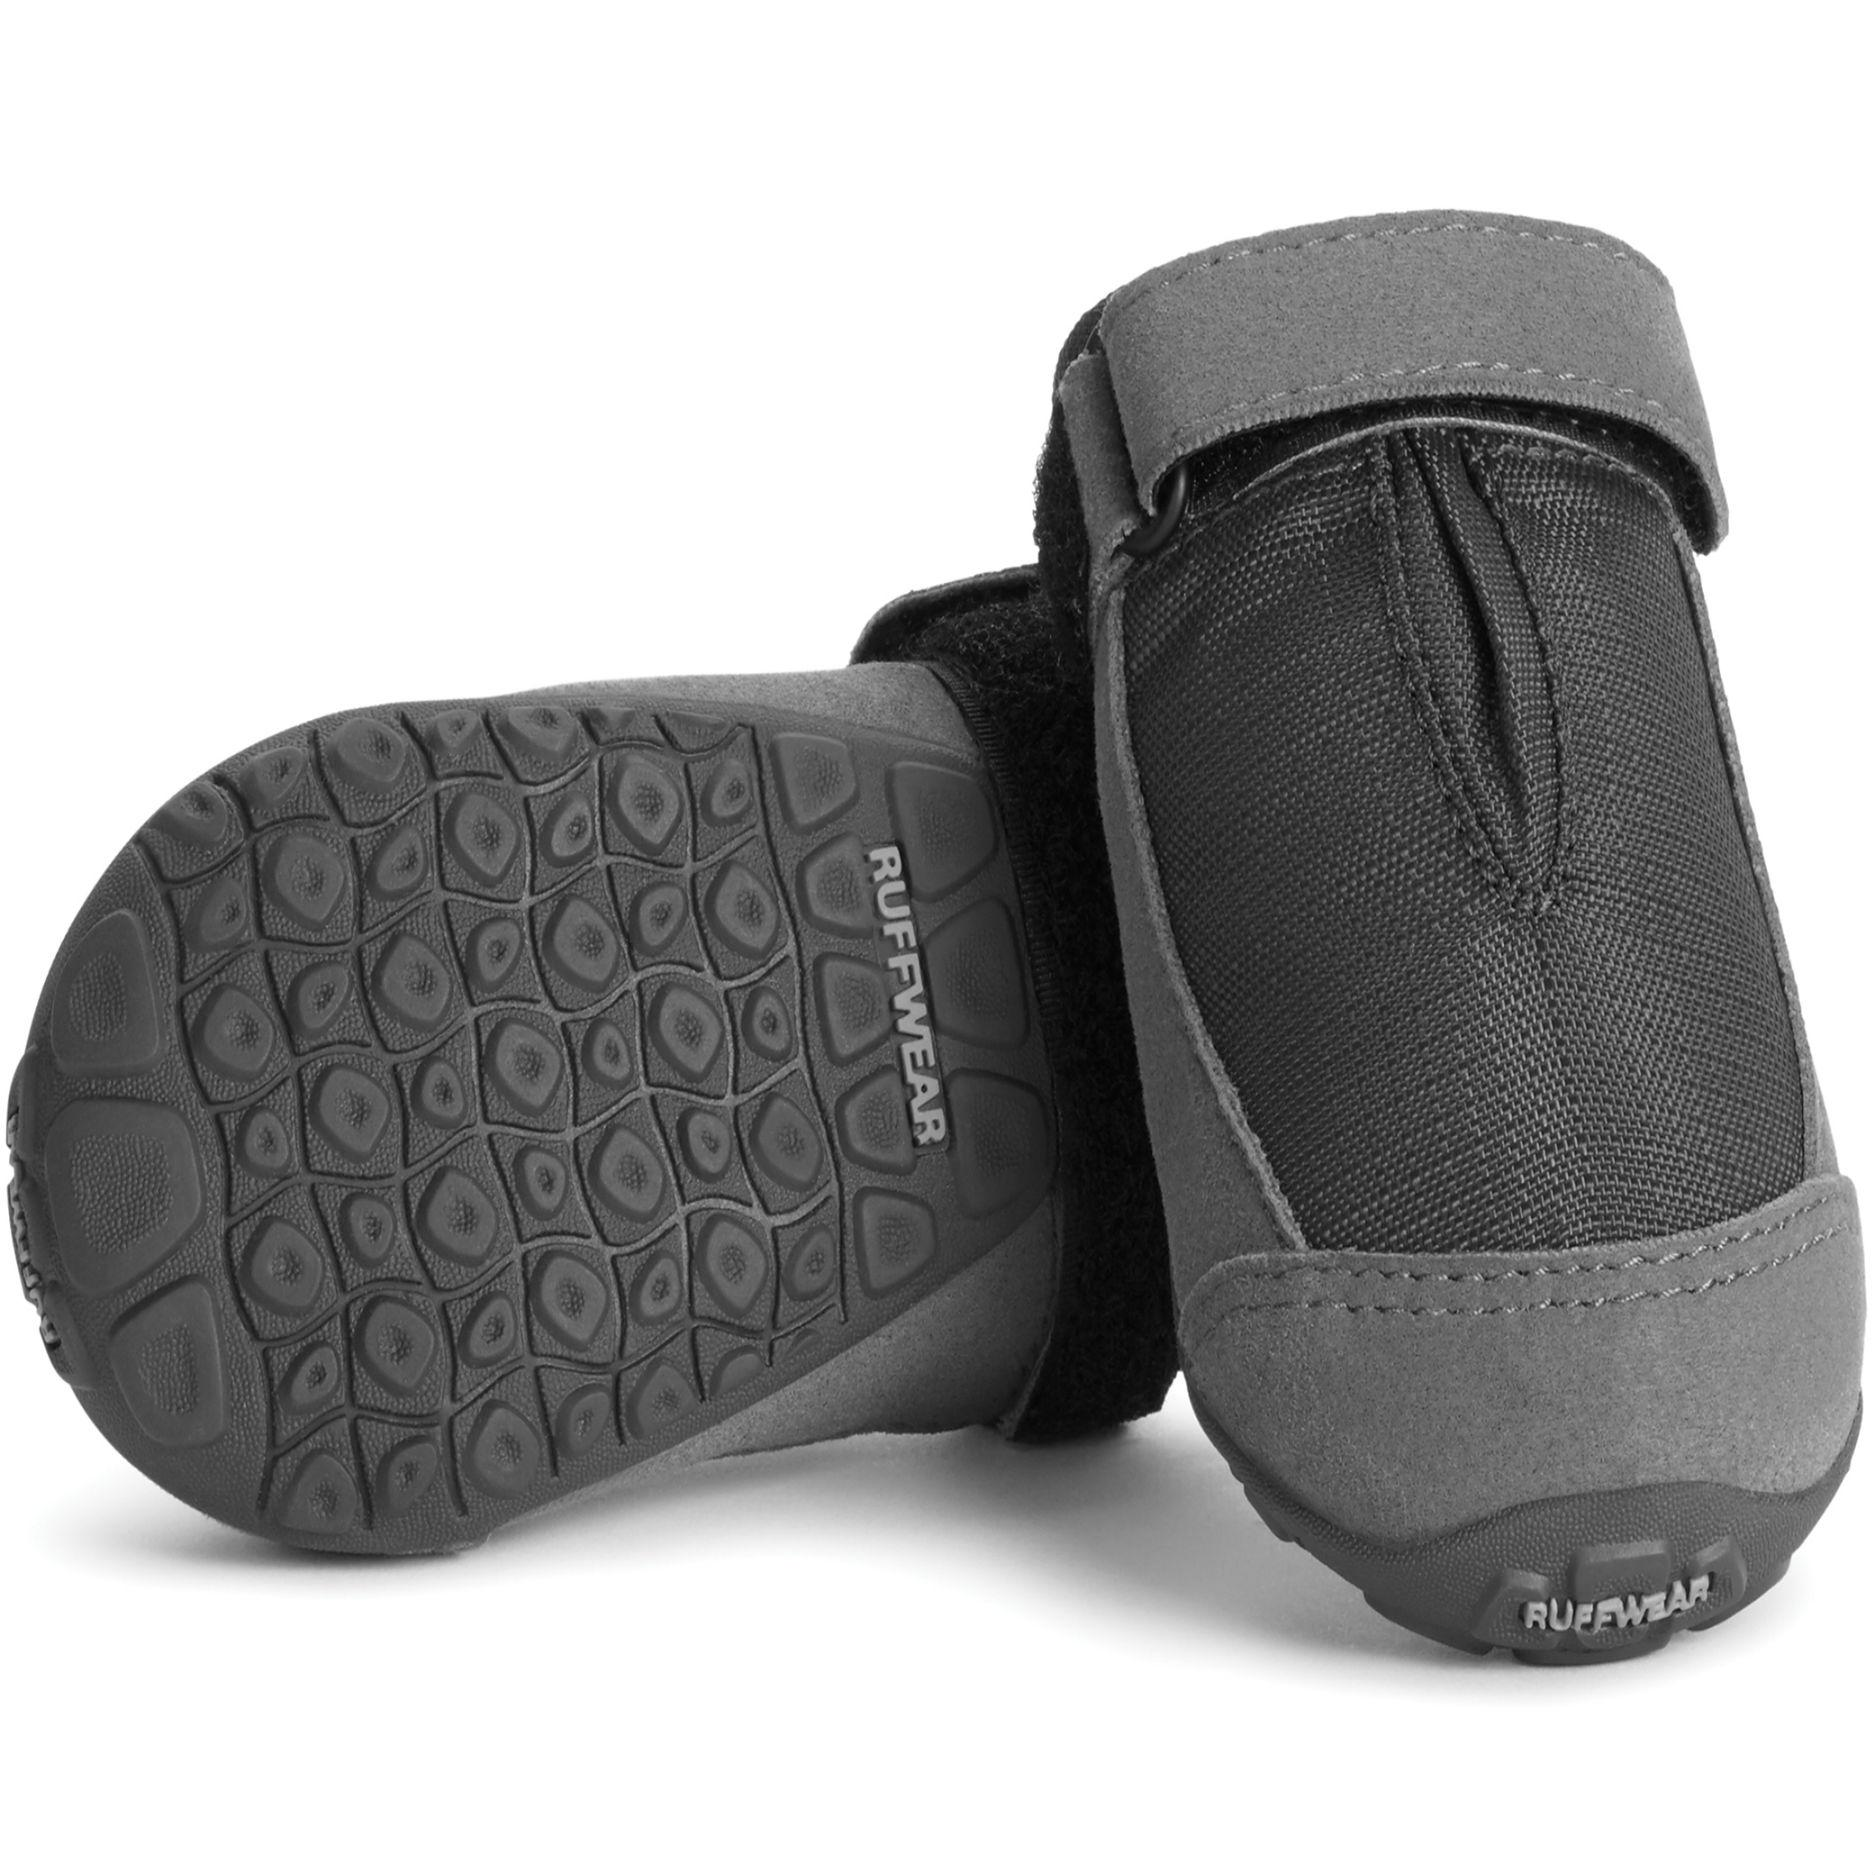 Summit Trex Dog Boots by Ruffwear - 2 Pack - Twilight Gray